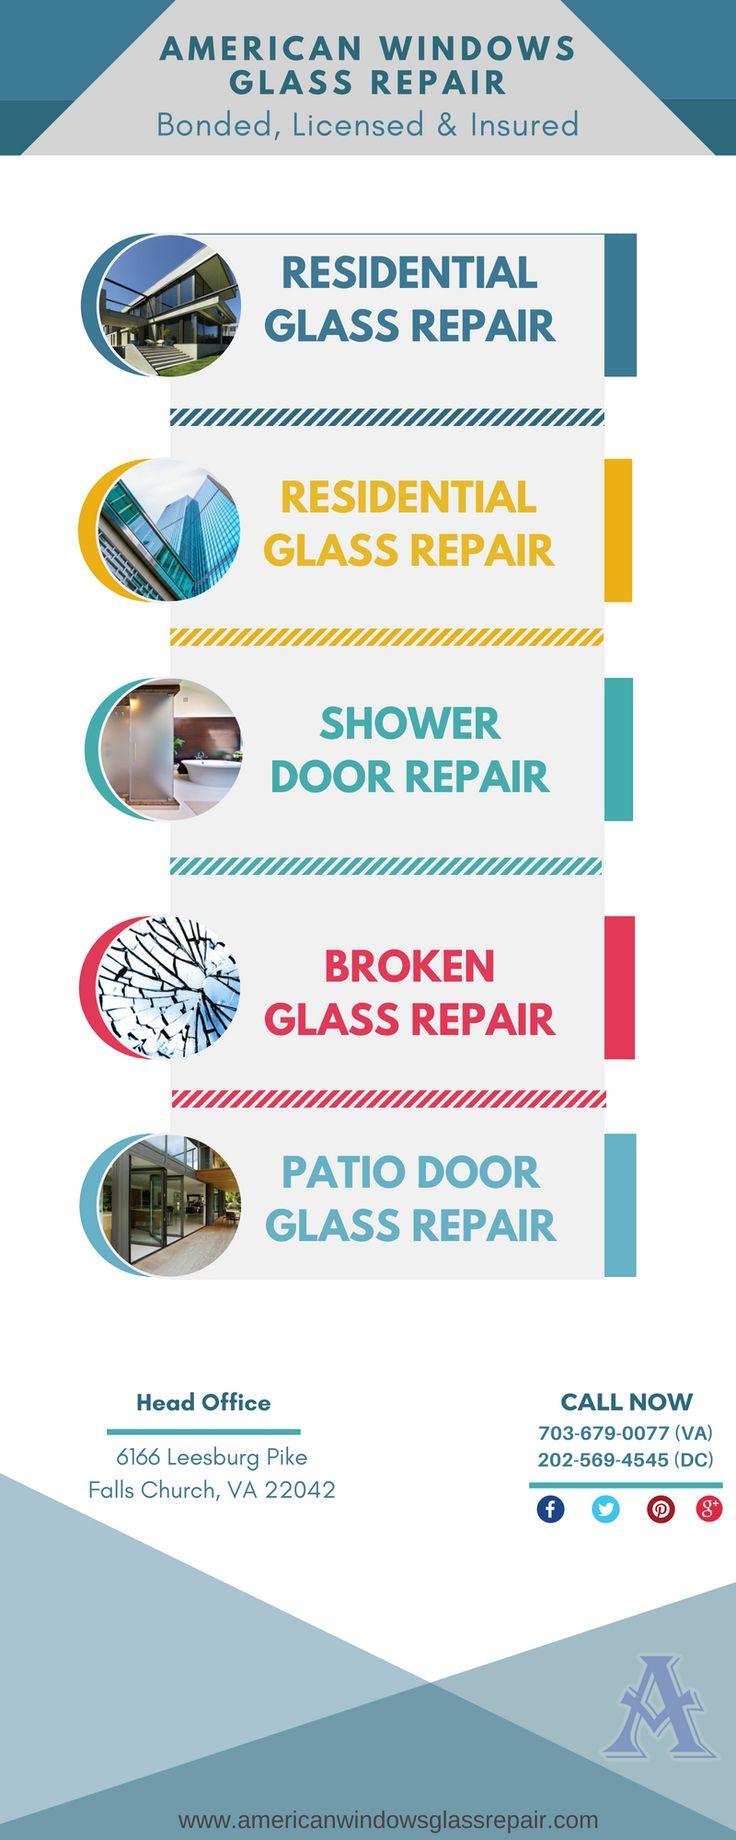 127 best American Windows Glass Repair images on Pinterest